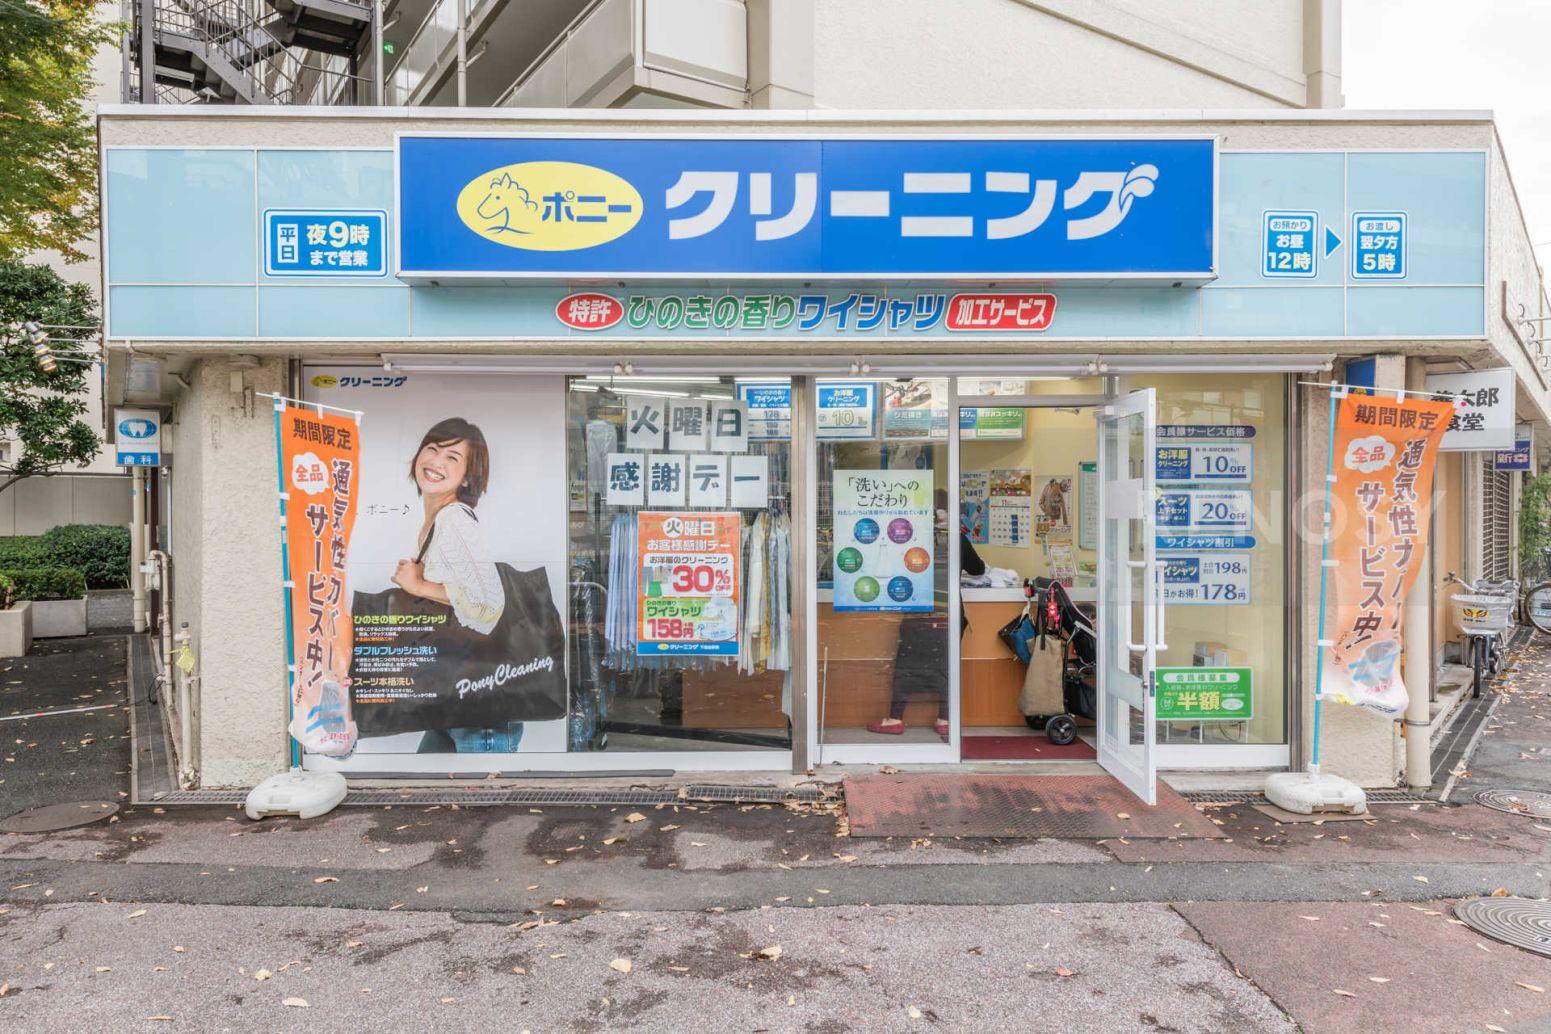 B City 高田馬場 alivie